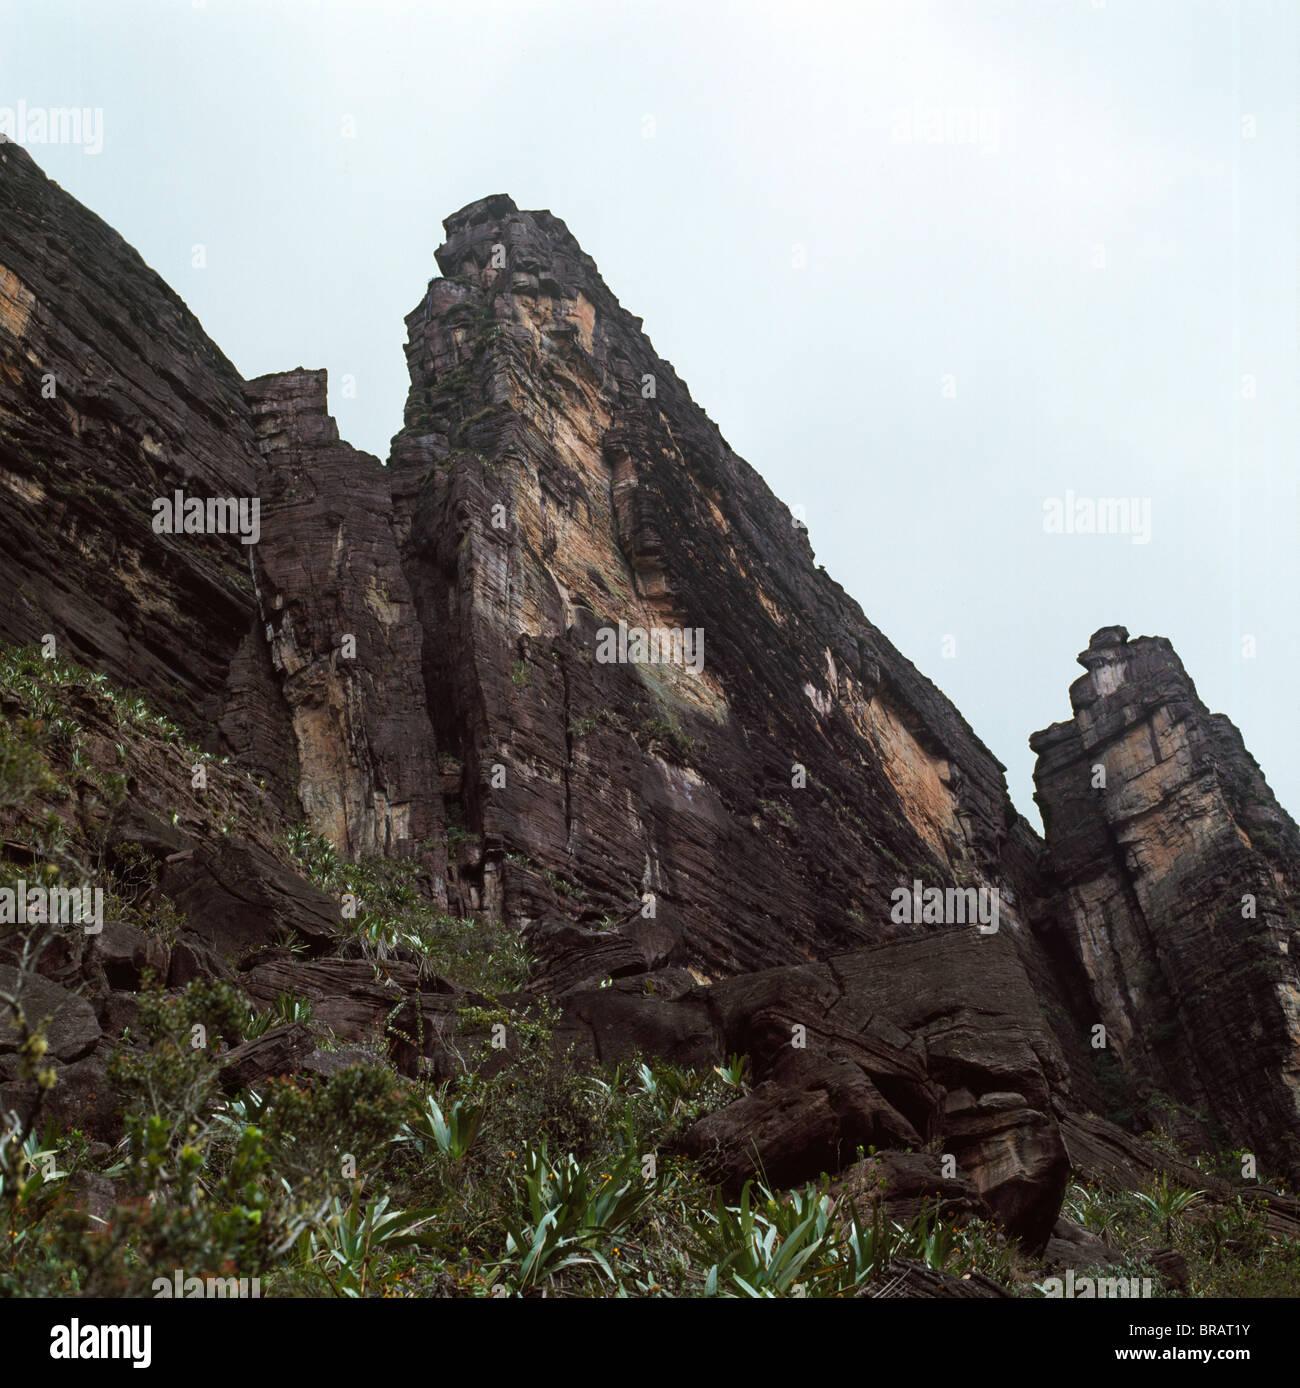 Ascent point showing the Chessman, Mount Kukenaam (Kukenan) (Cuguenan), Estado Bolivar, Venezuela, South America - Stock Image